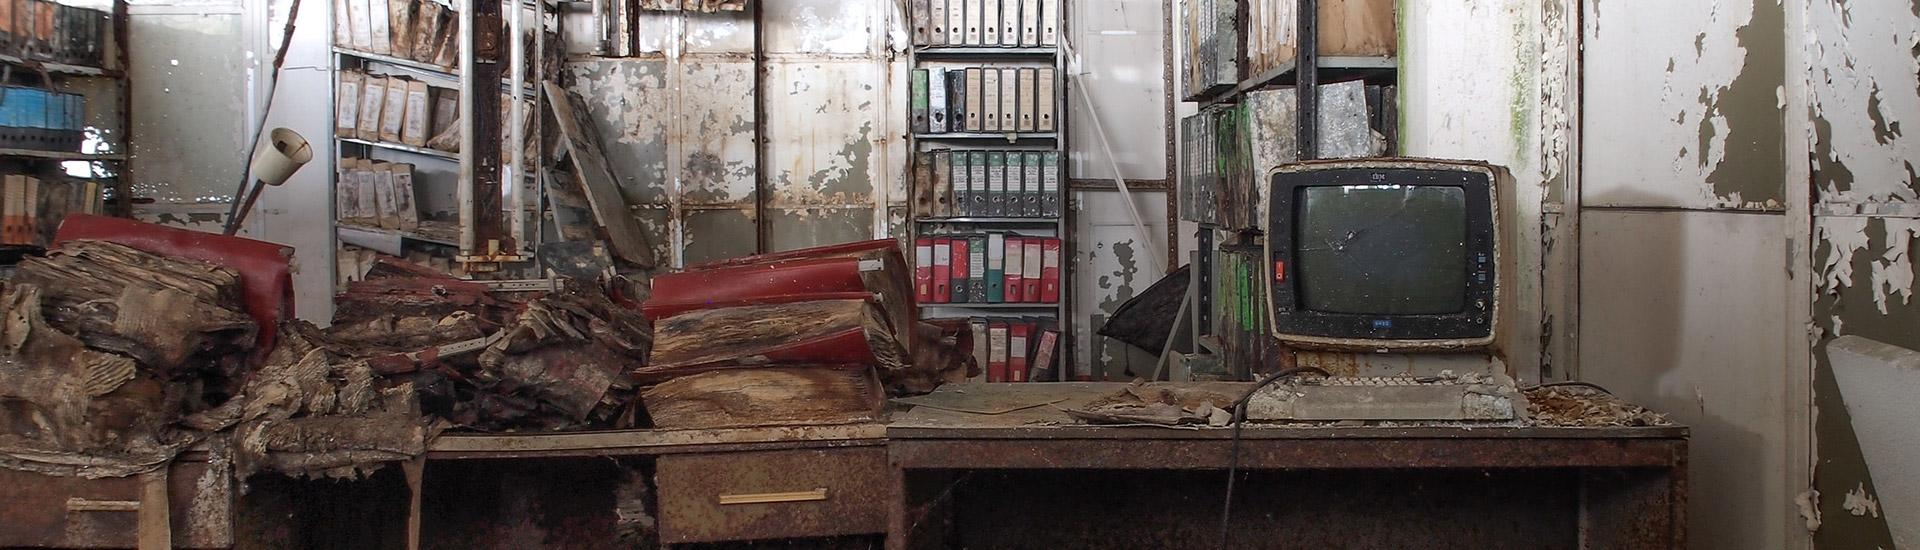 Lugares Abandonados Septiembre Octubre 2016 Abandoned Spain Urbex